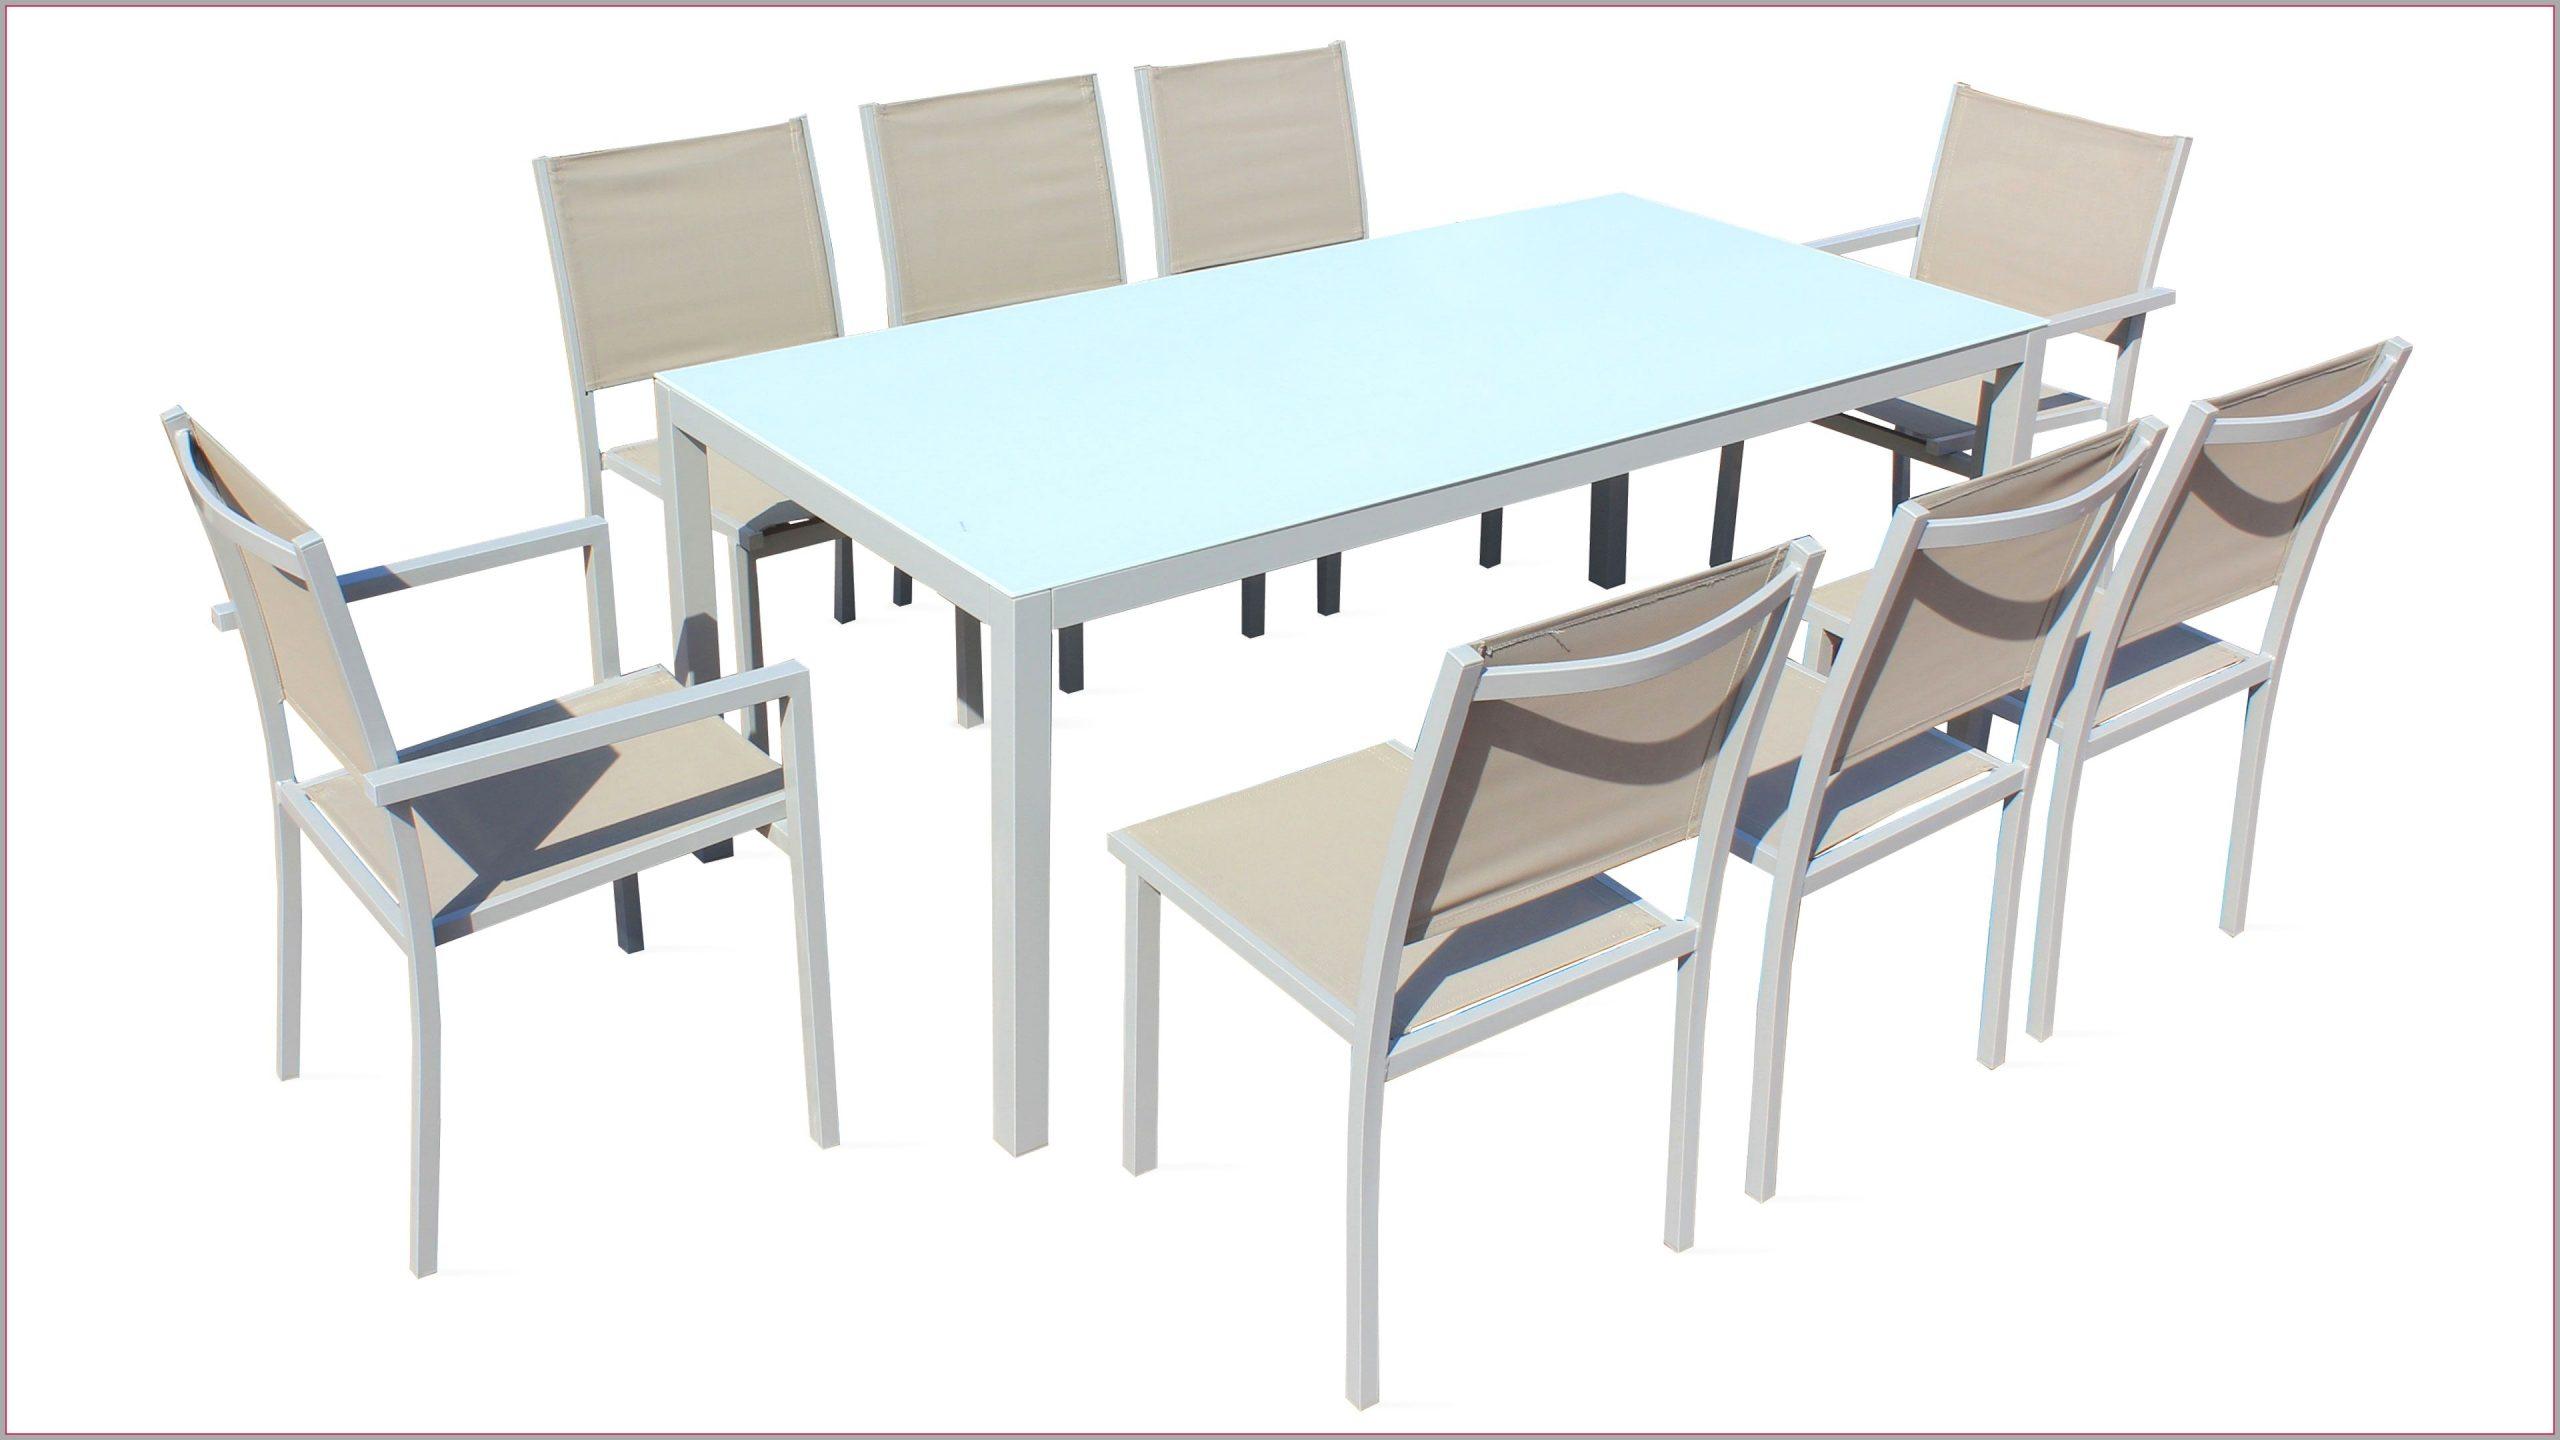 Banc De Jardin Jardiland New Table Aluminium Charmant Banc ... intérieur Table De Jardin Aluminium Jardiland